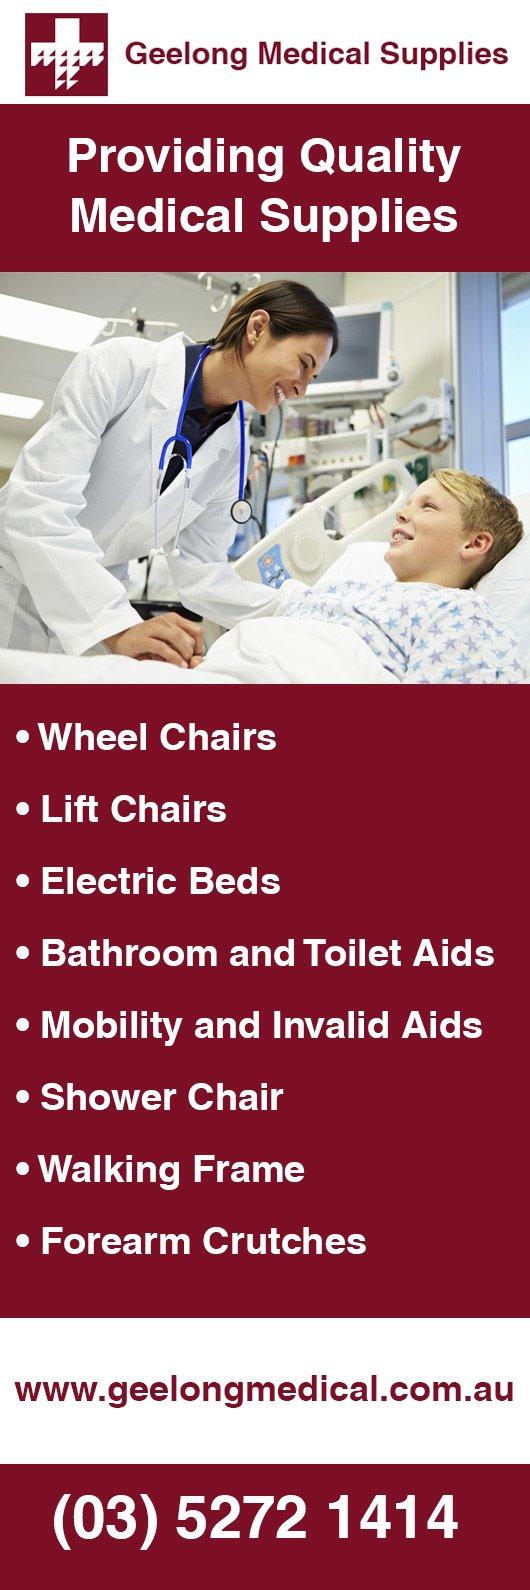 Geelong Medical Supplies Pty Ltd Home Health Care Equipment 1